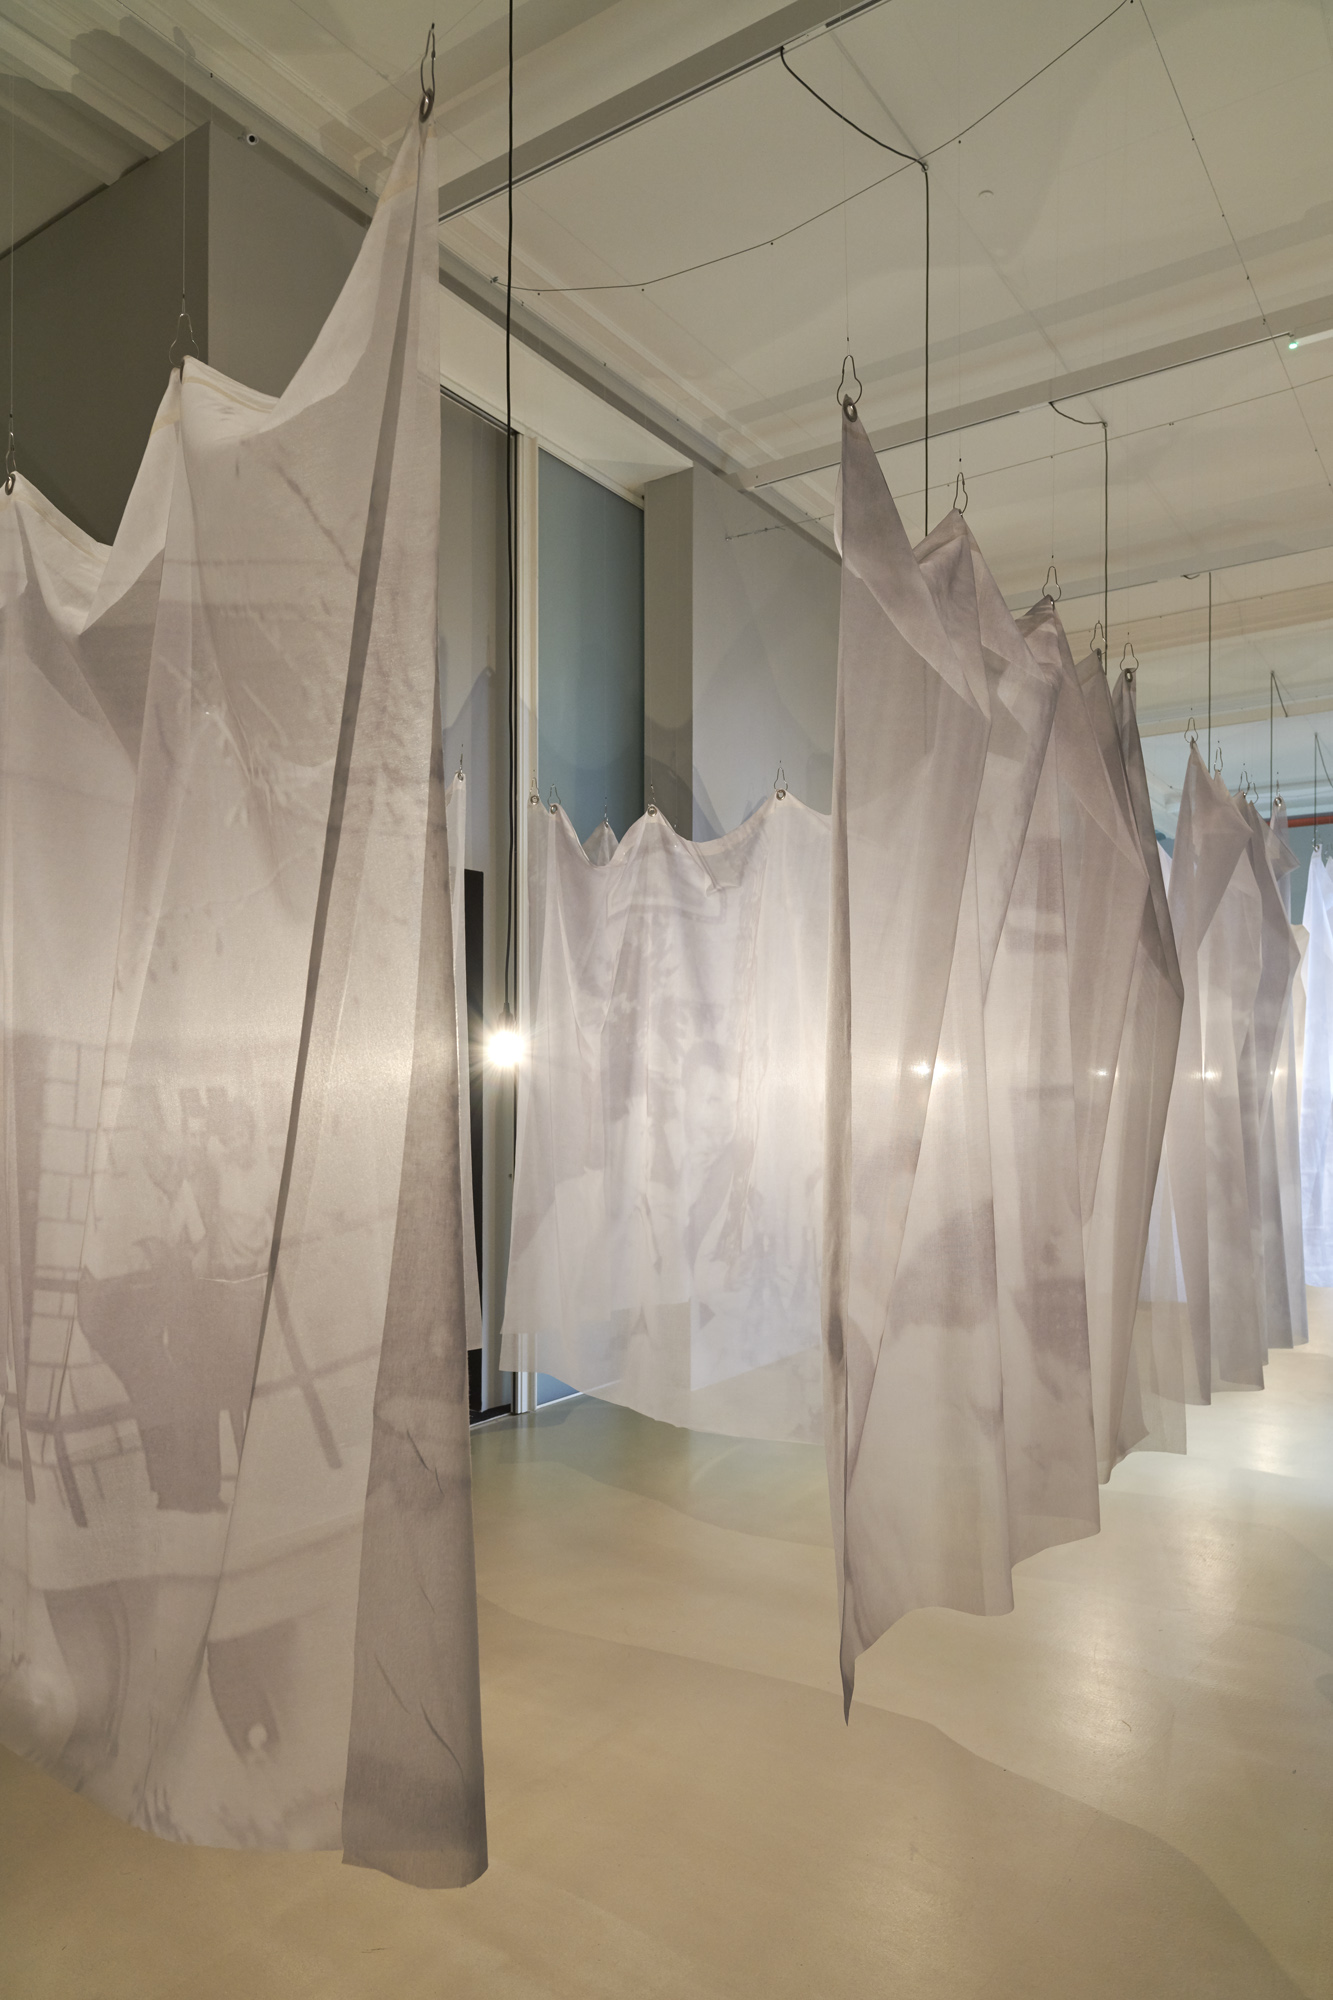 La traversée de la vie (The Crossing of Life), 2015 31 printed veils, 12 light bulbs, wire, electric wire